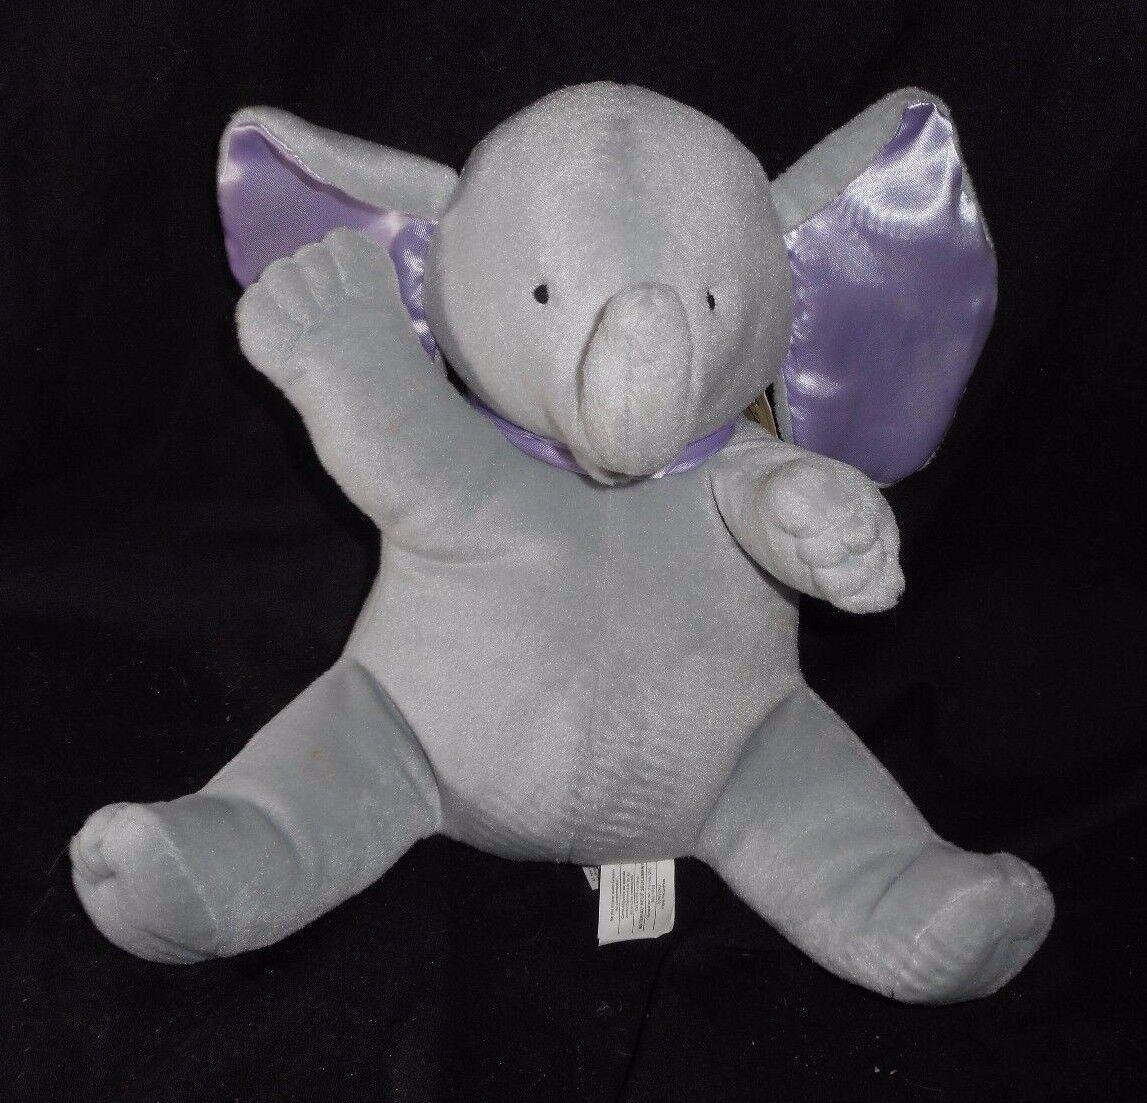 VINTAGE NORTH AMERICAN BABY ELEPHANT SATIN EARS MUSICAL STUFFED ANIMAL PLUSH TOY